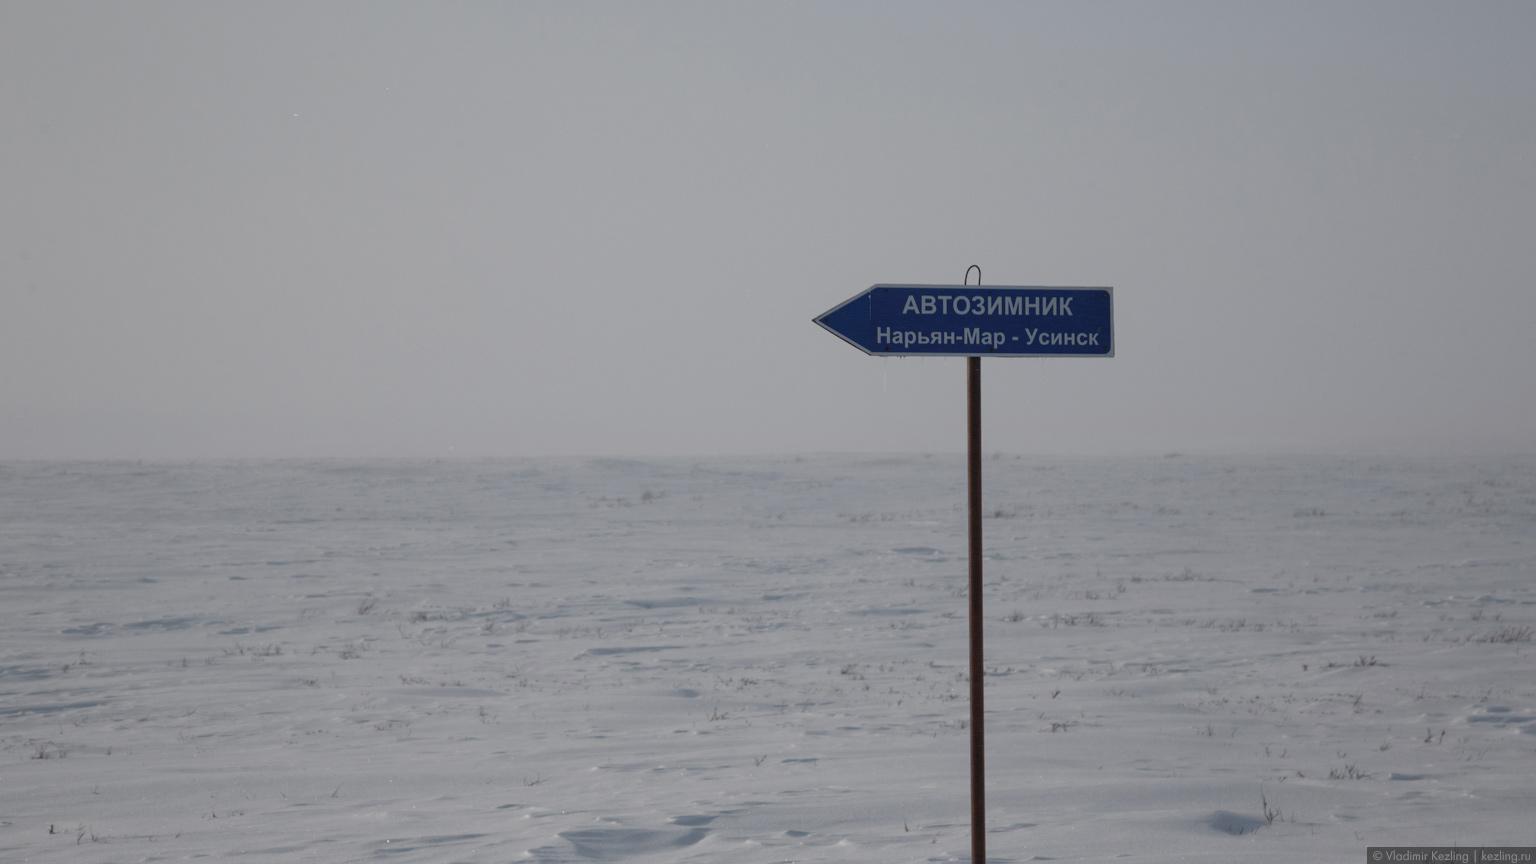 Нарьян-Мар - Сыктывкар